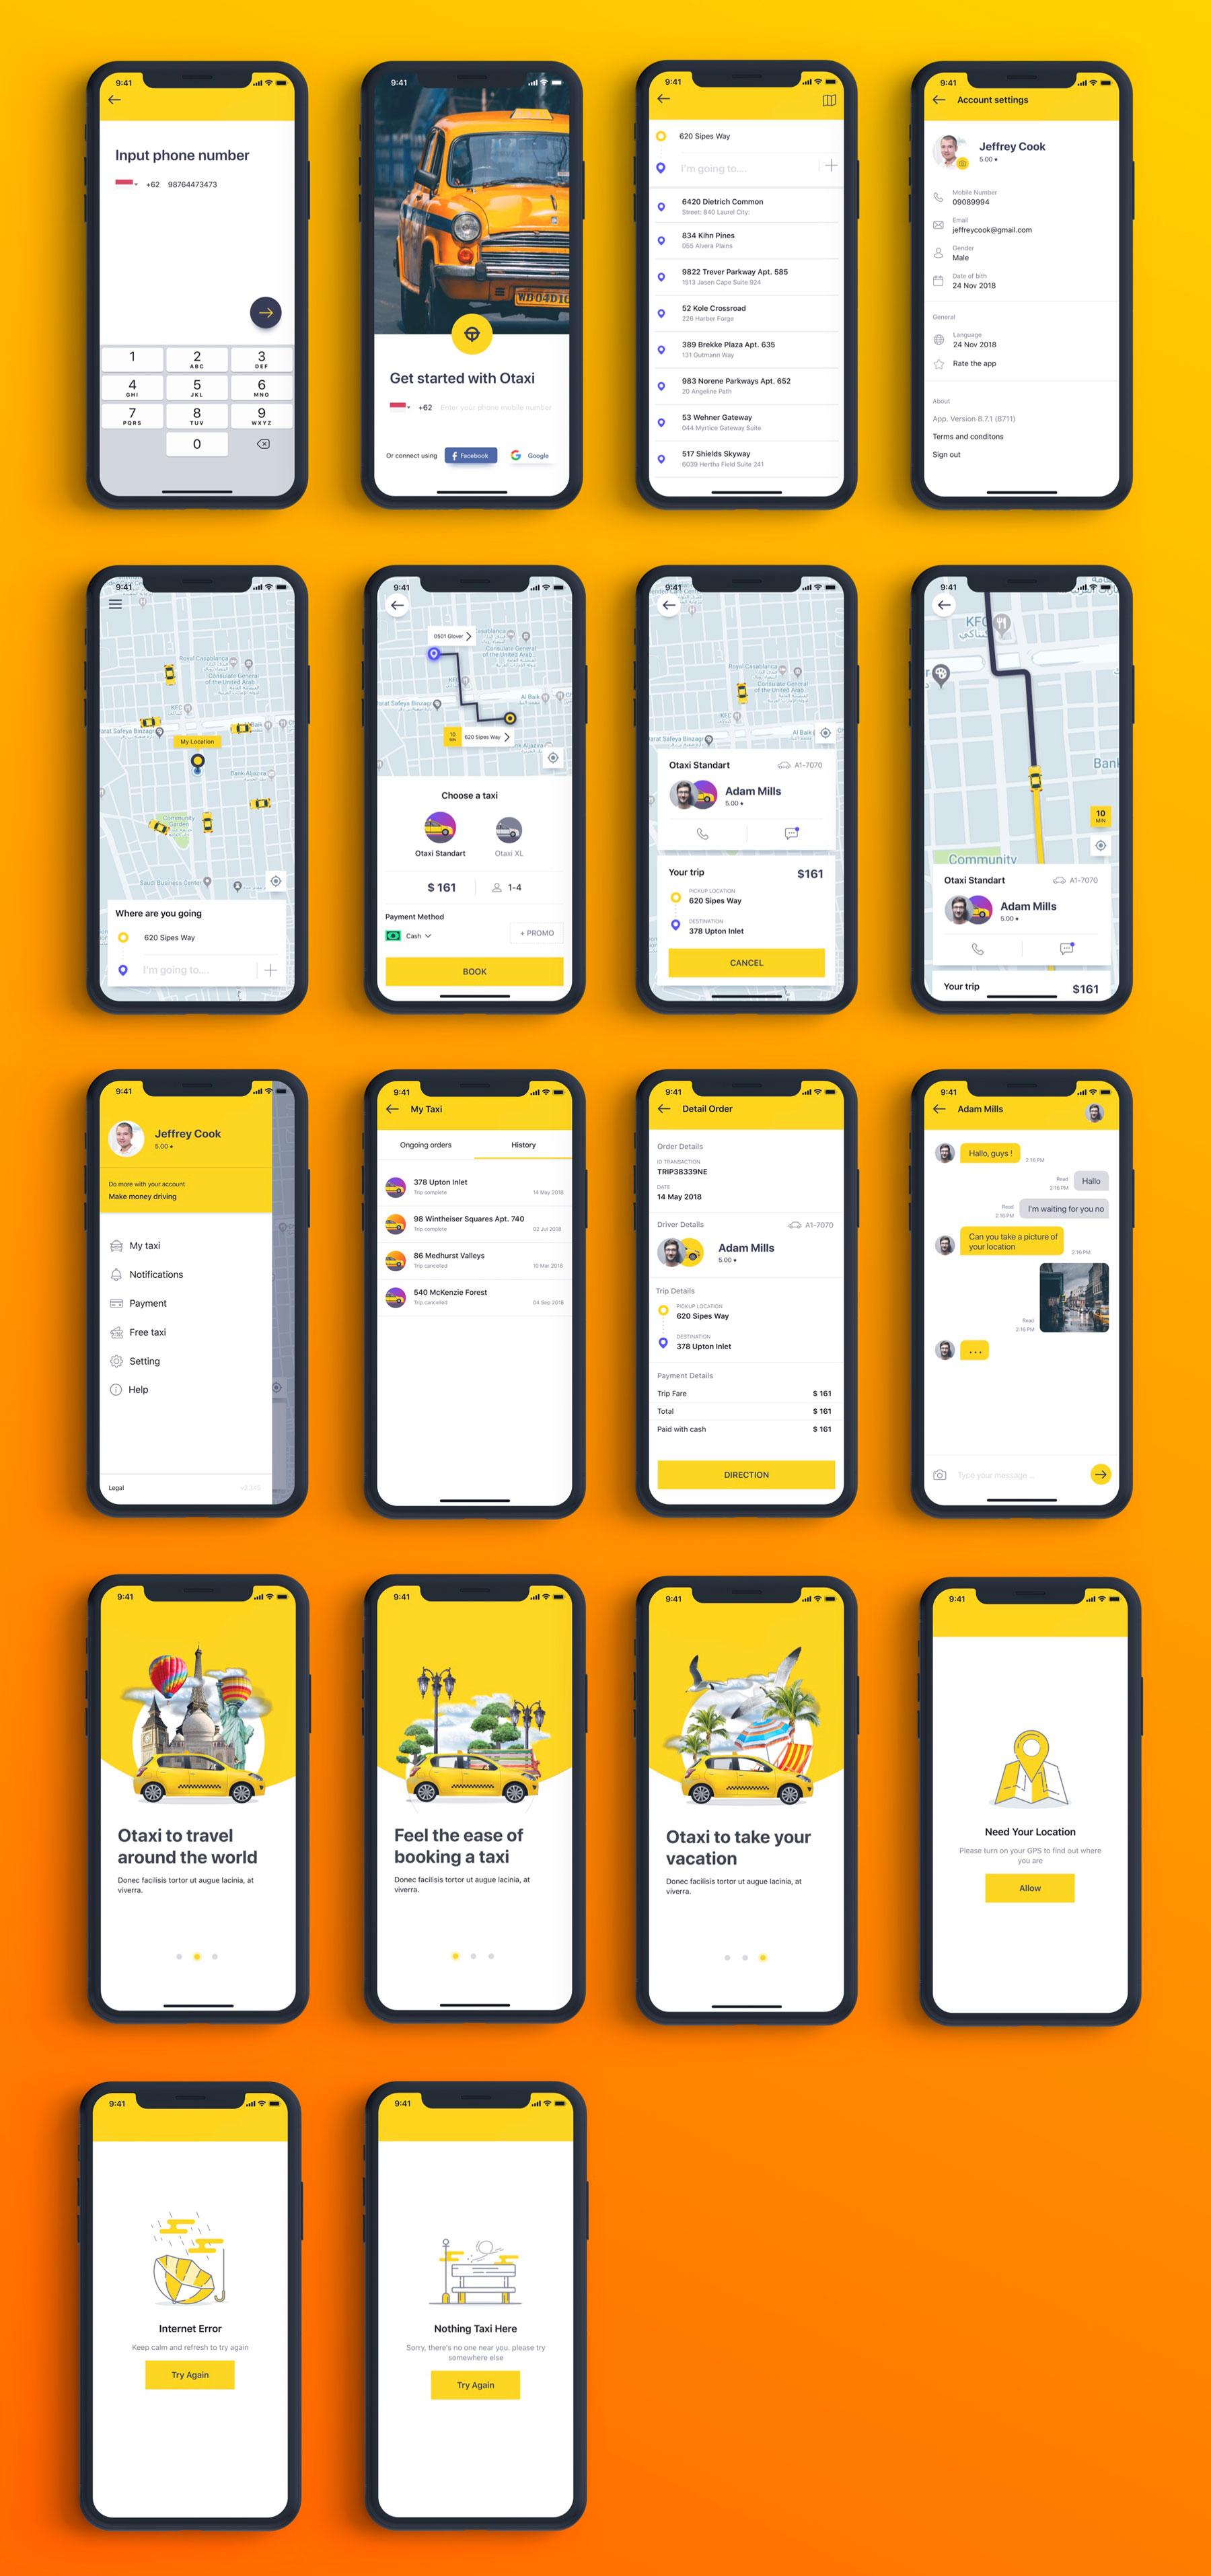 类Uber&滴滴出行叫车APP应用UI设计套件SKETCH模板 Otaxi Mobile UI Kit插图(6)